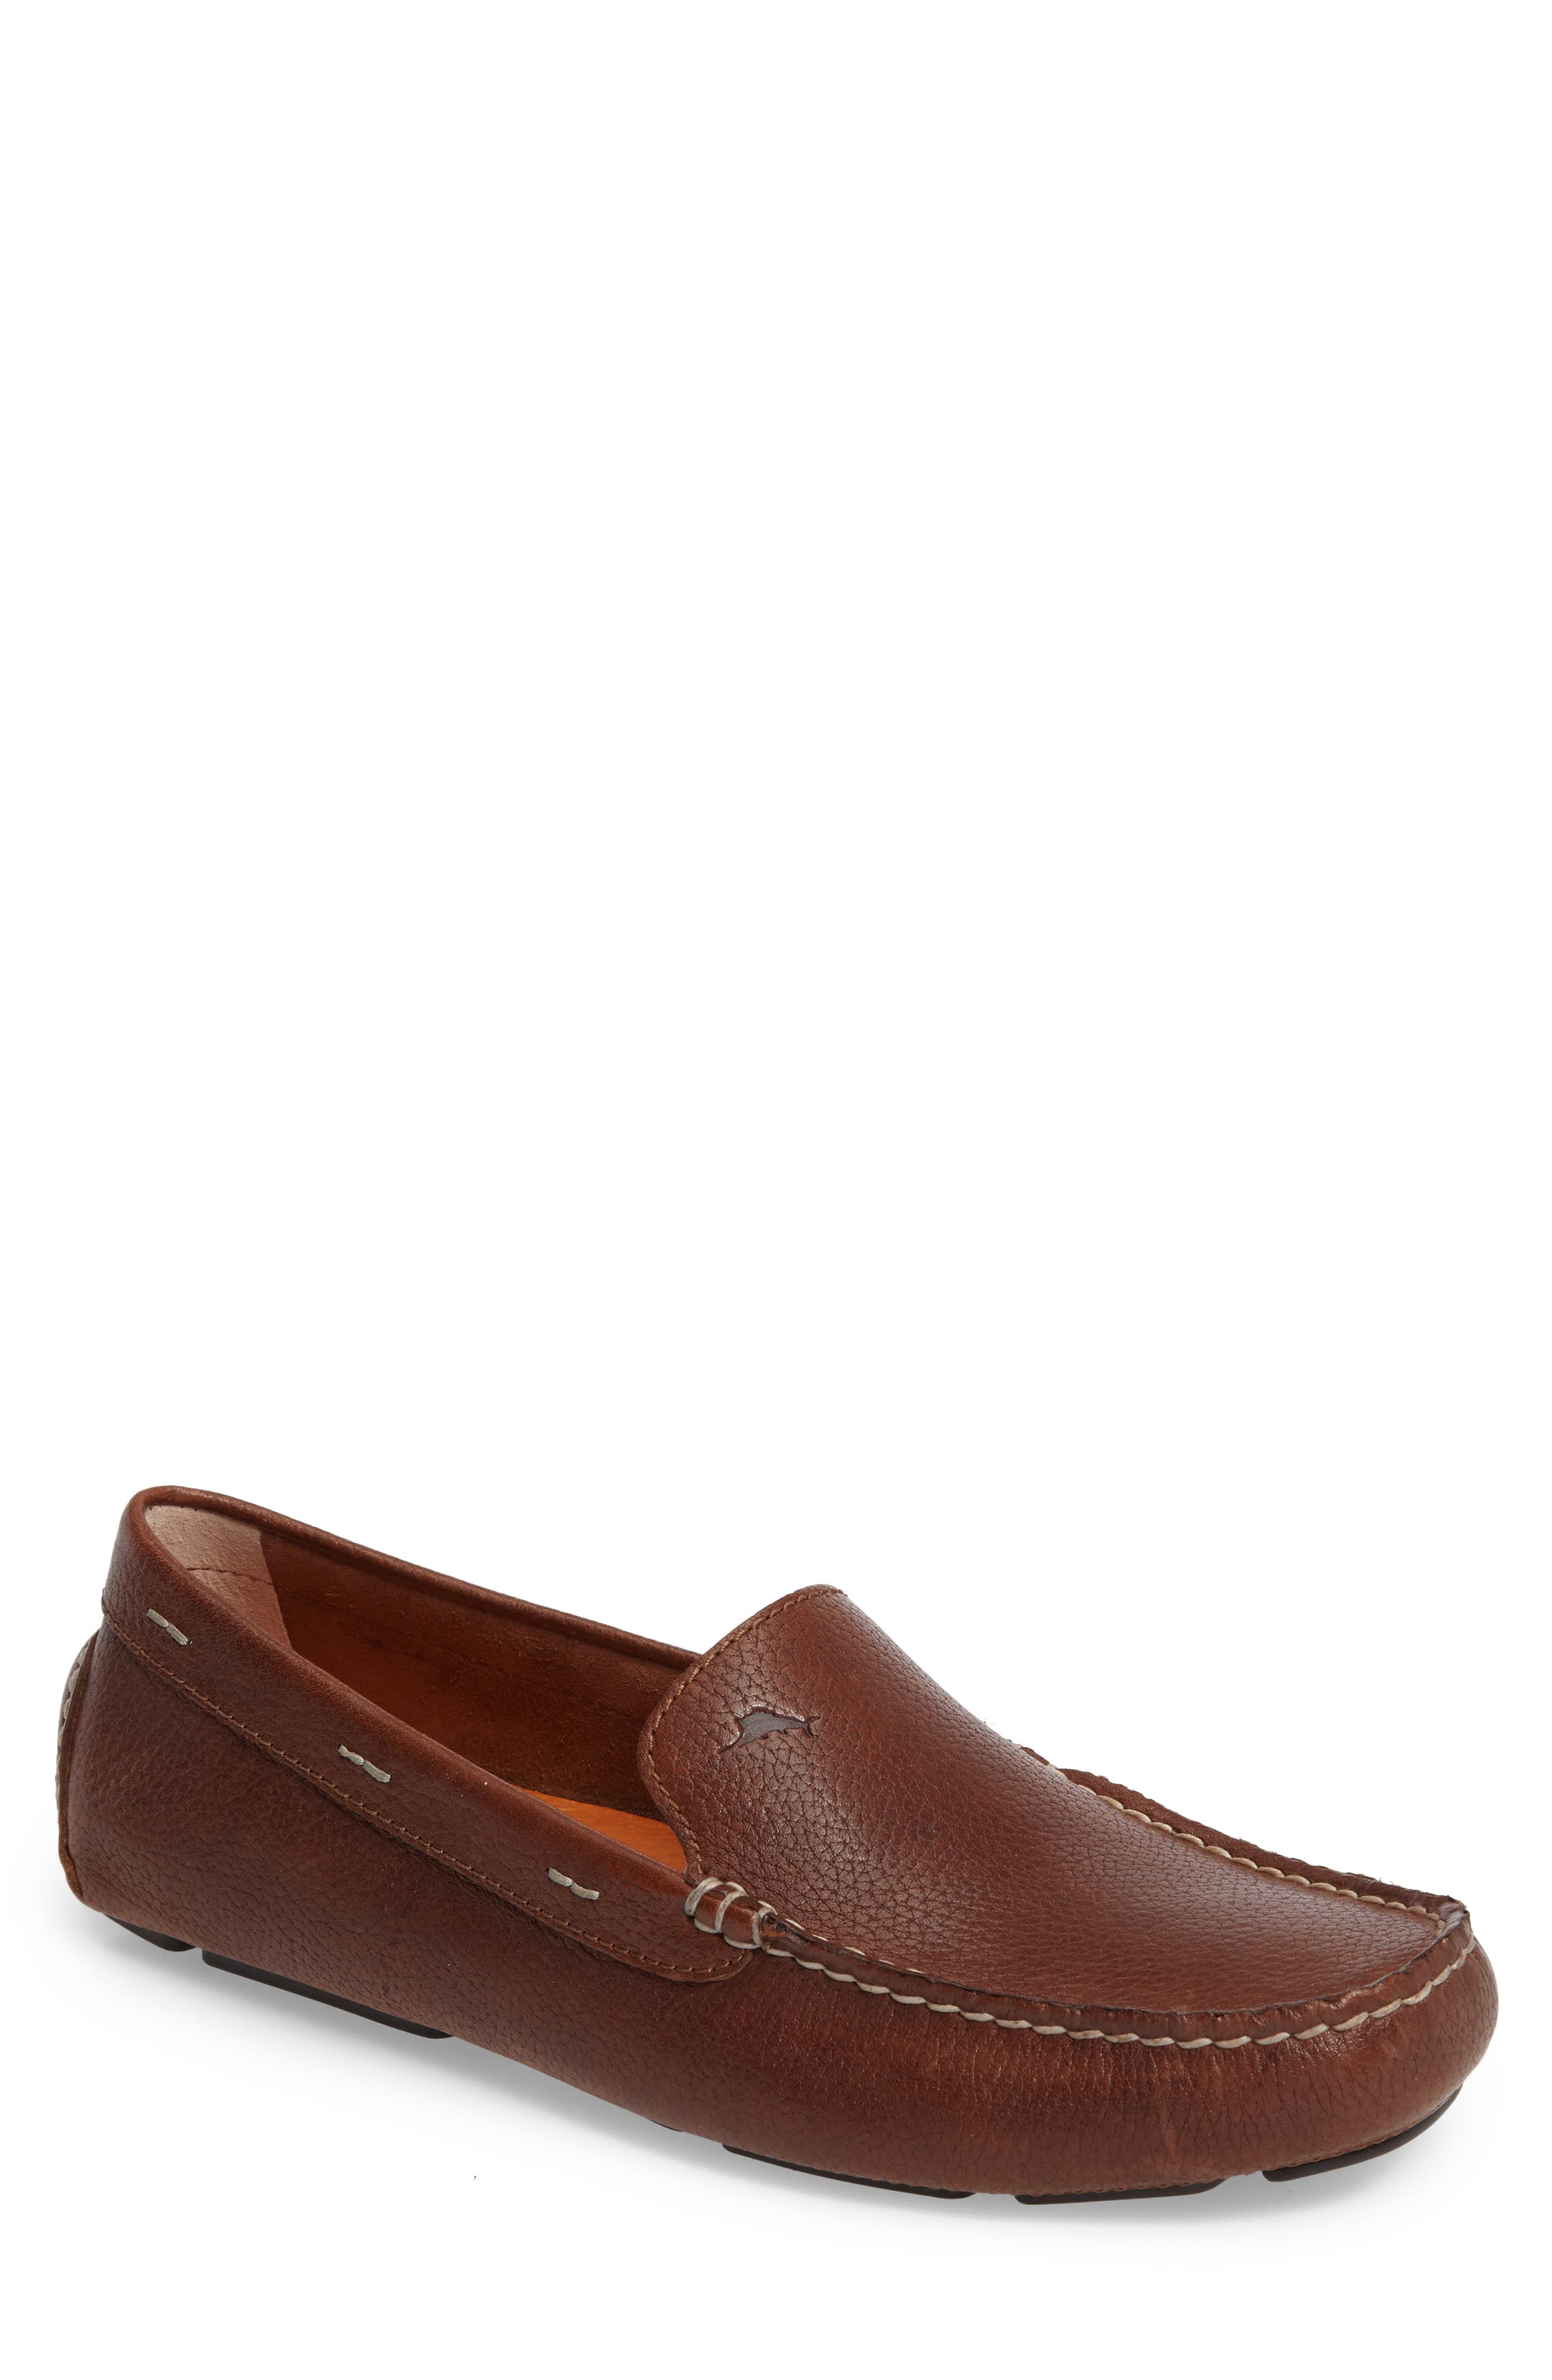 Alternate Image 1 Selected - Tommy Bahama Pagota Driving Loafer (Men)